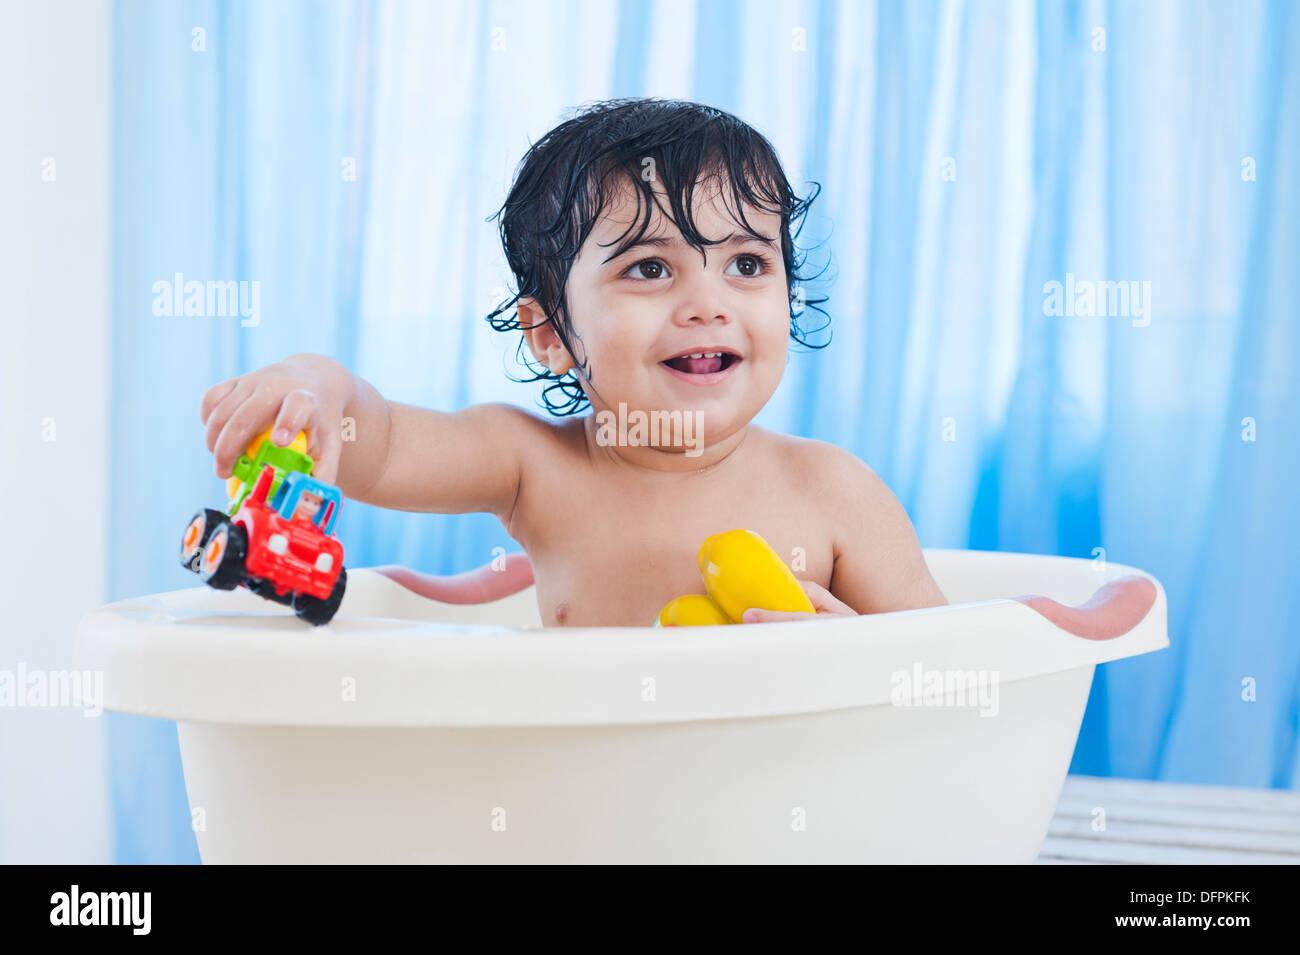 Indian Baby Bathing Stock Photos & Indian Baby Bathing Stock Images ...